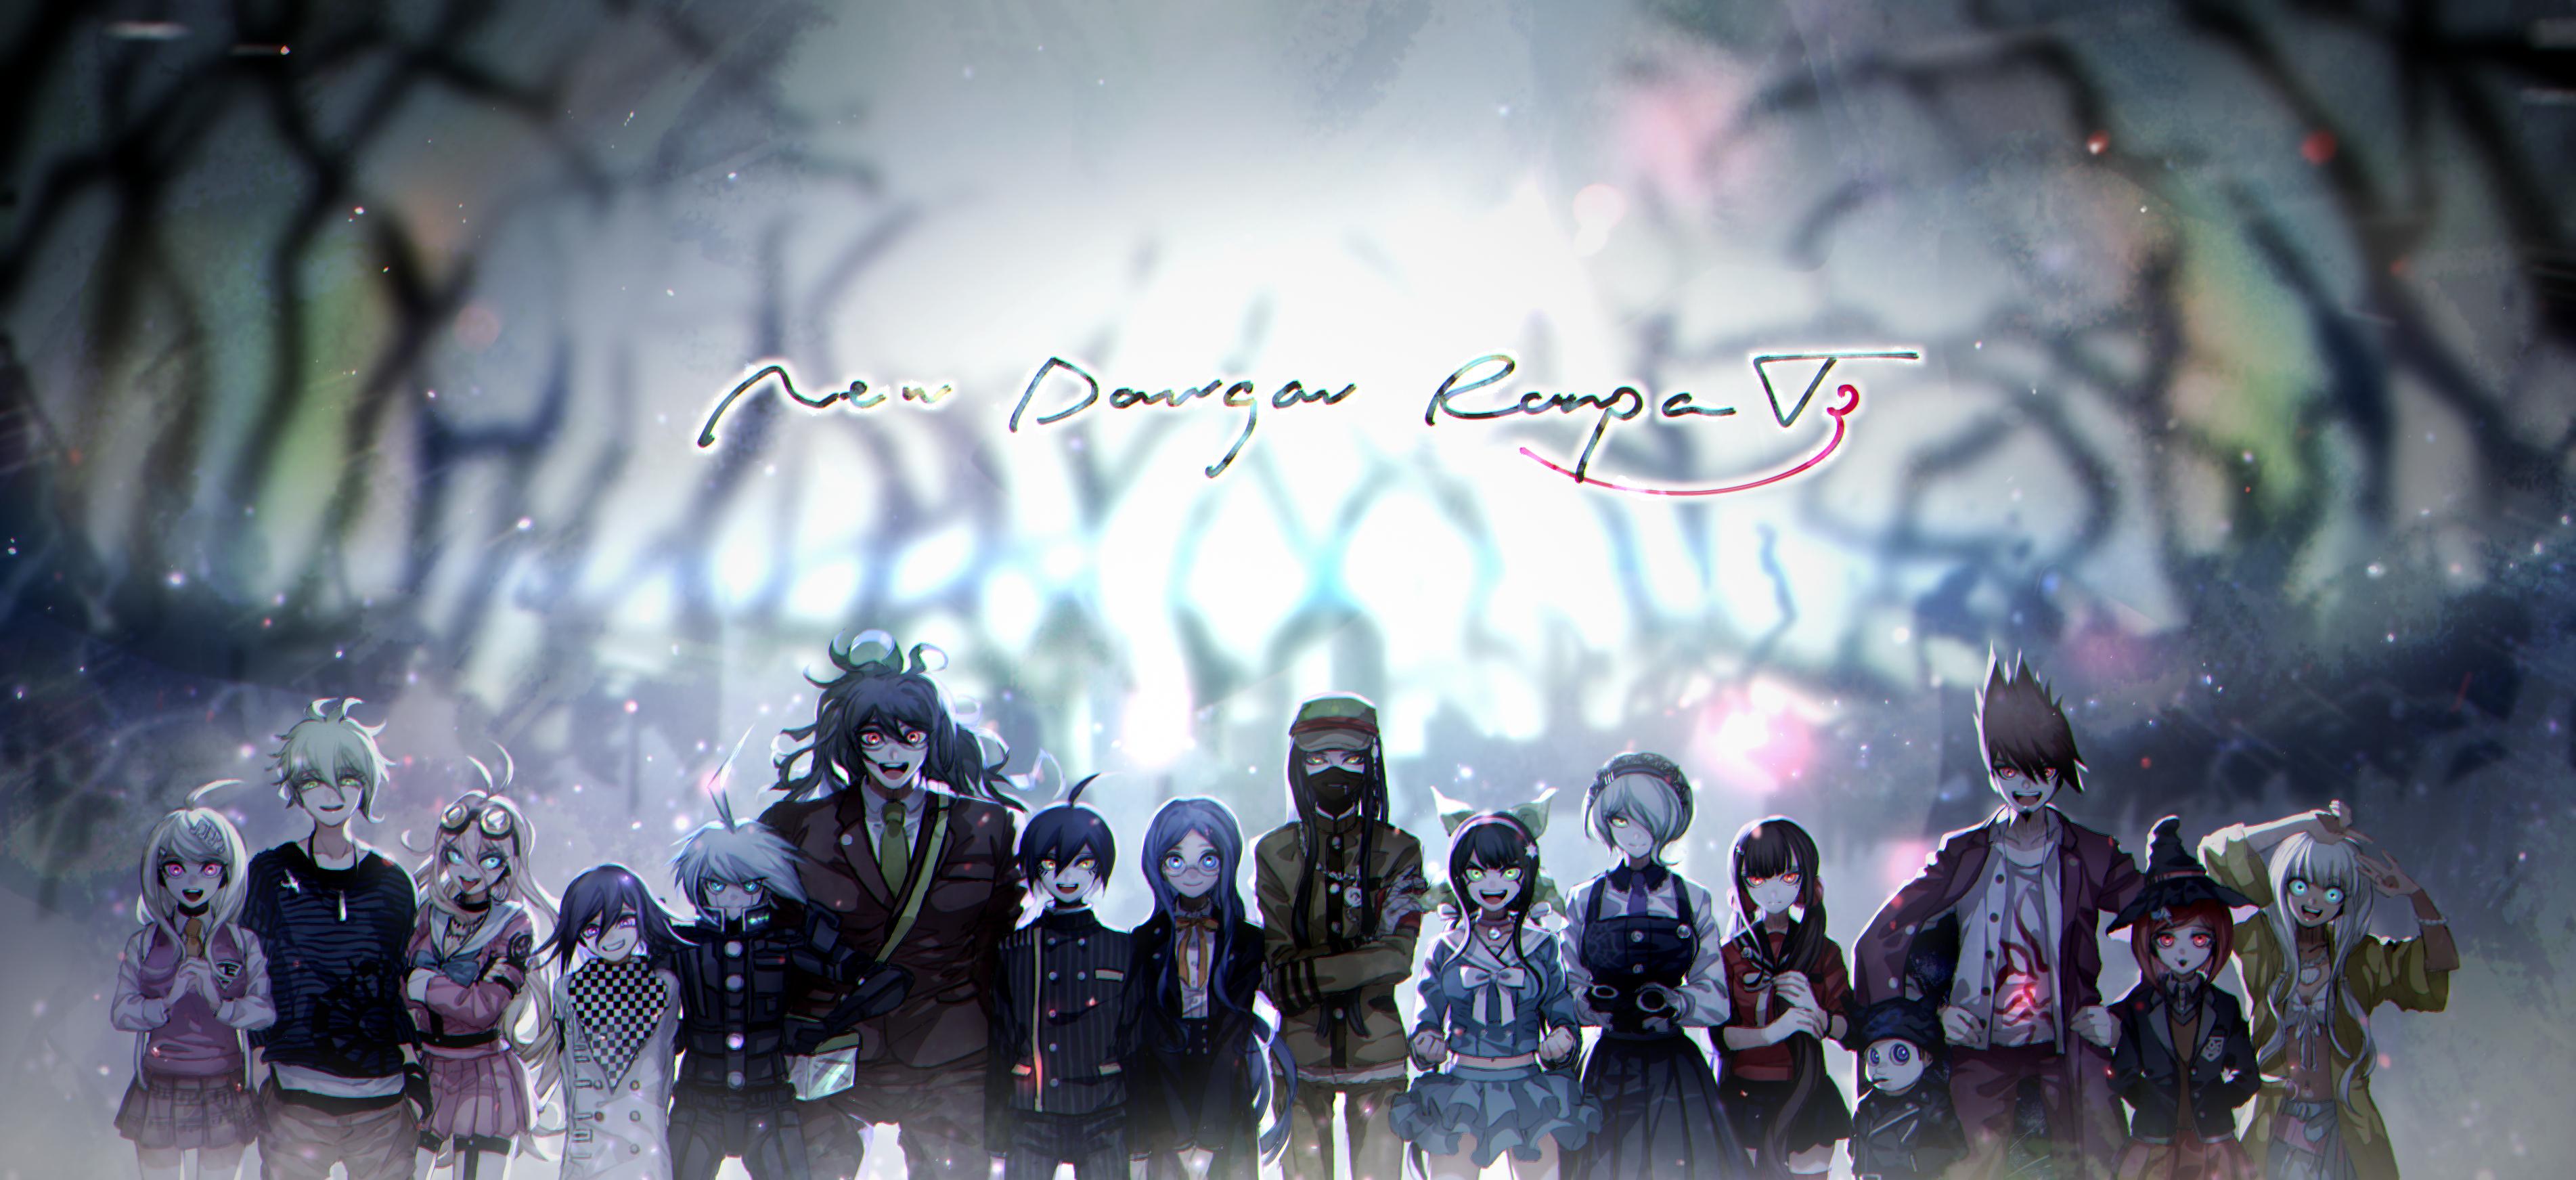 New Danganronpa V3 (Danganronpa V3: Killing Harmony) Image #2108761